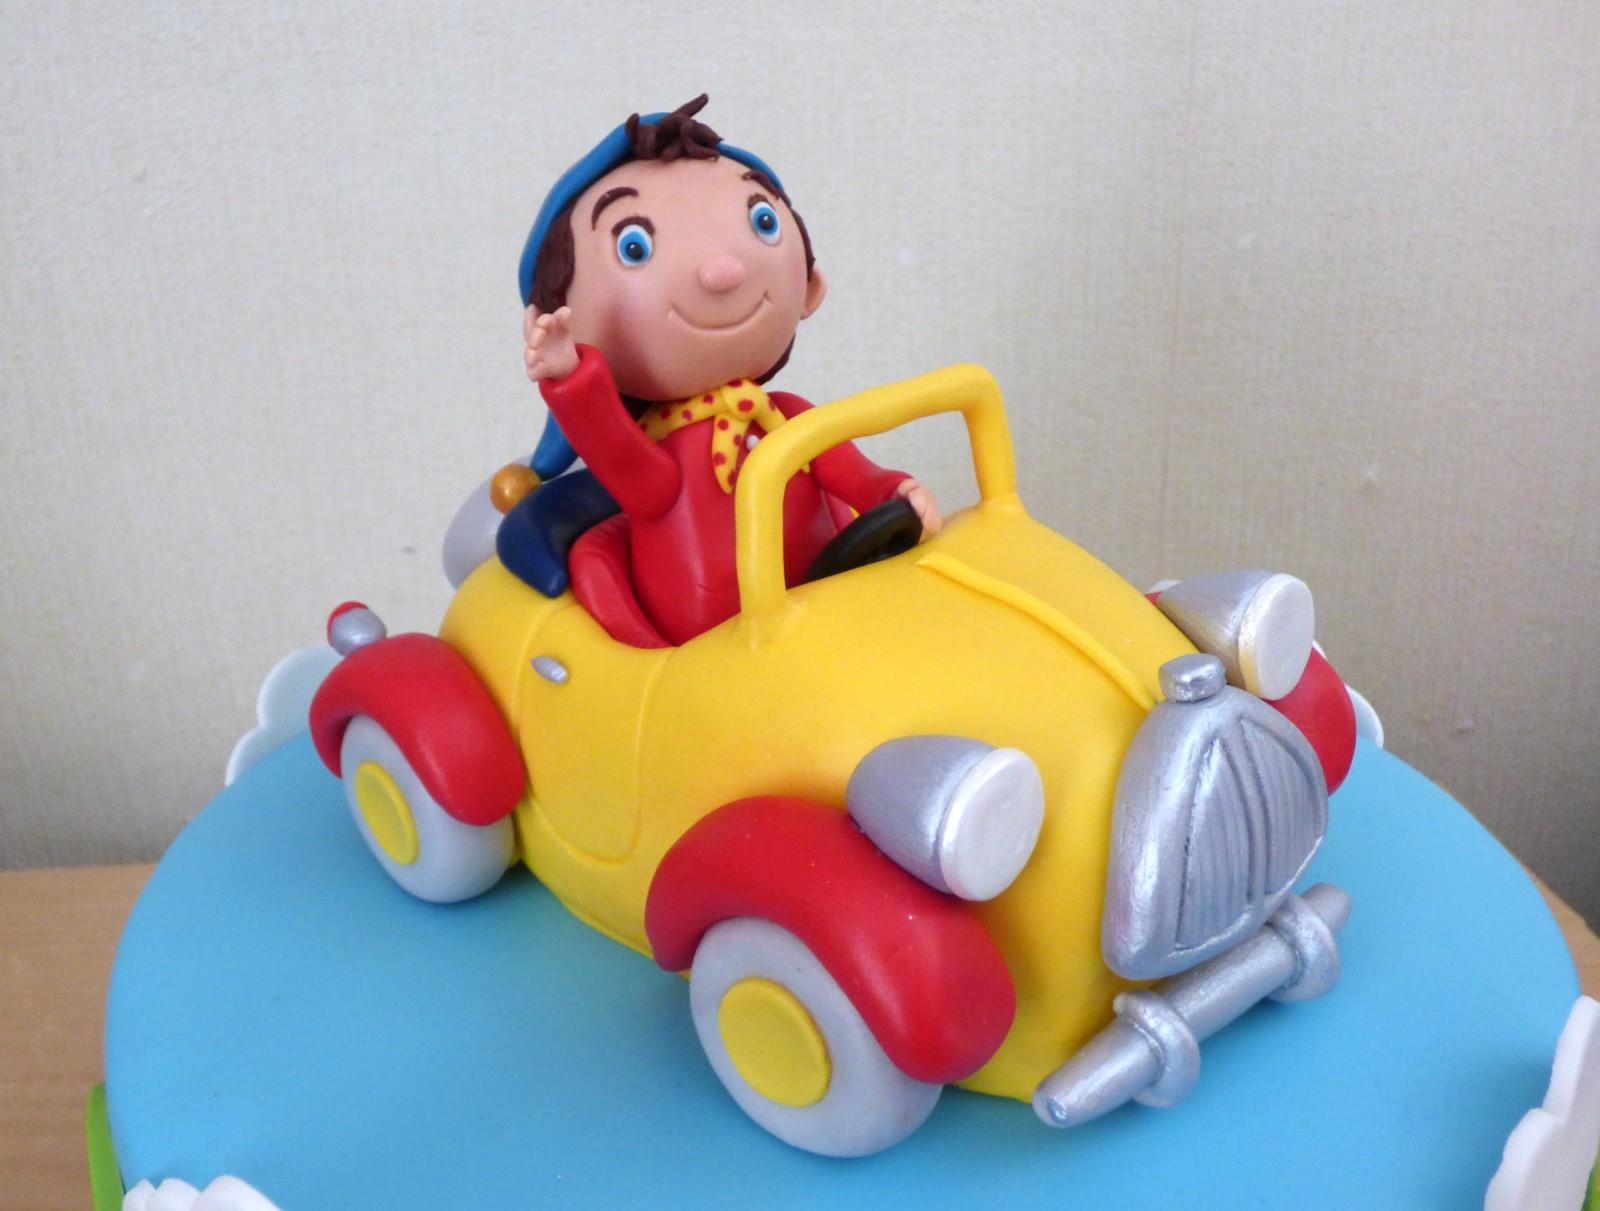 Outstanding Noddy In His Car Birthday Cake Susies Cakes Funny Birthday Cards Online Hetedamsfinfo